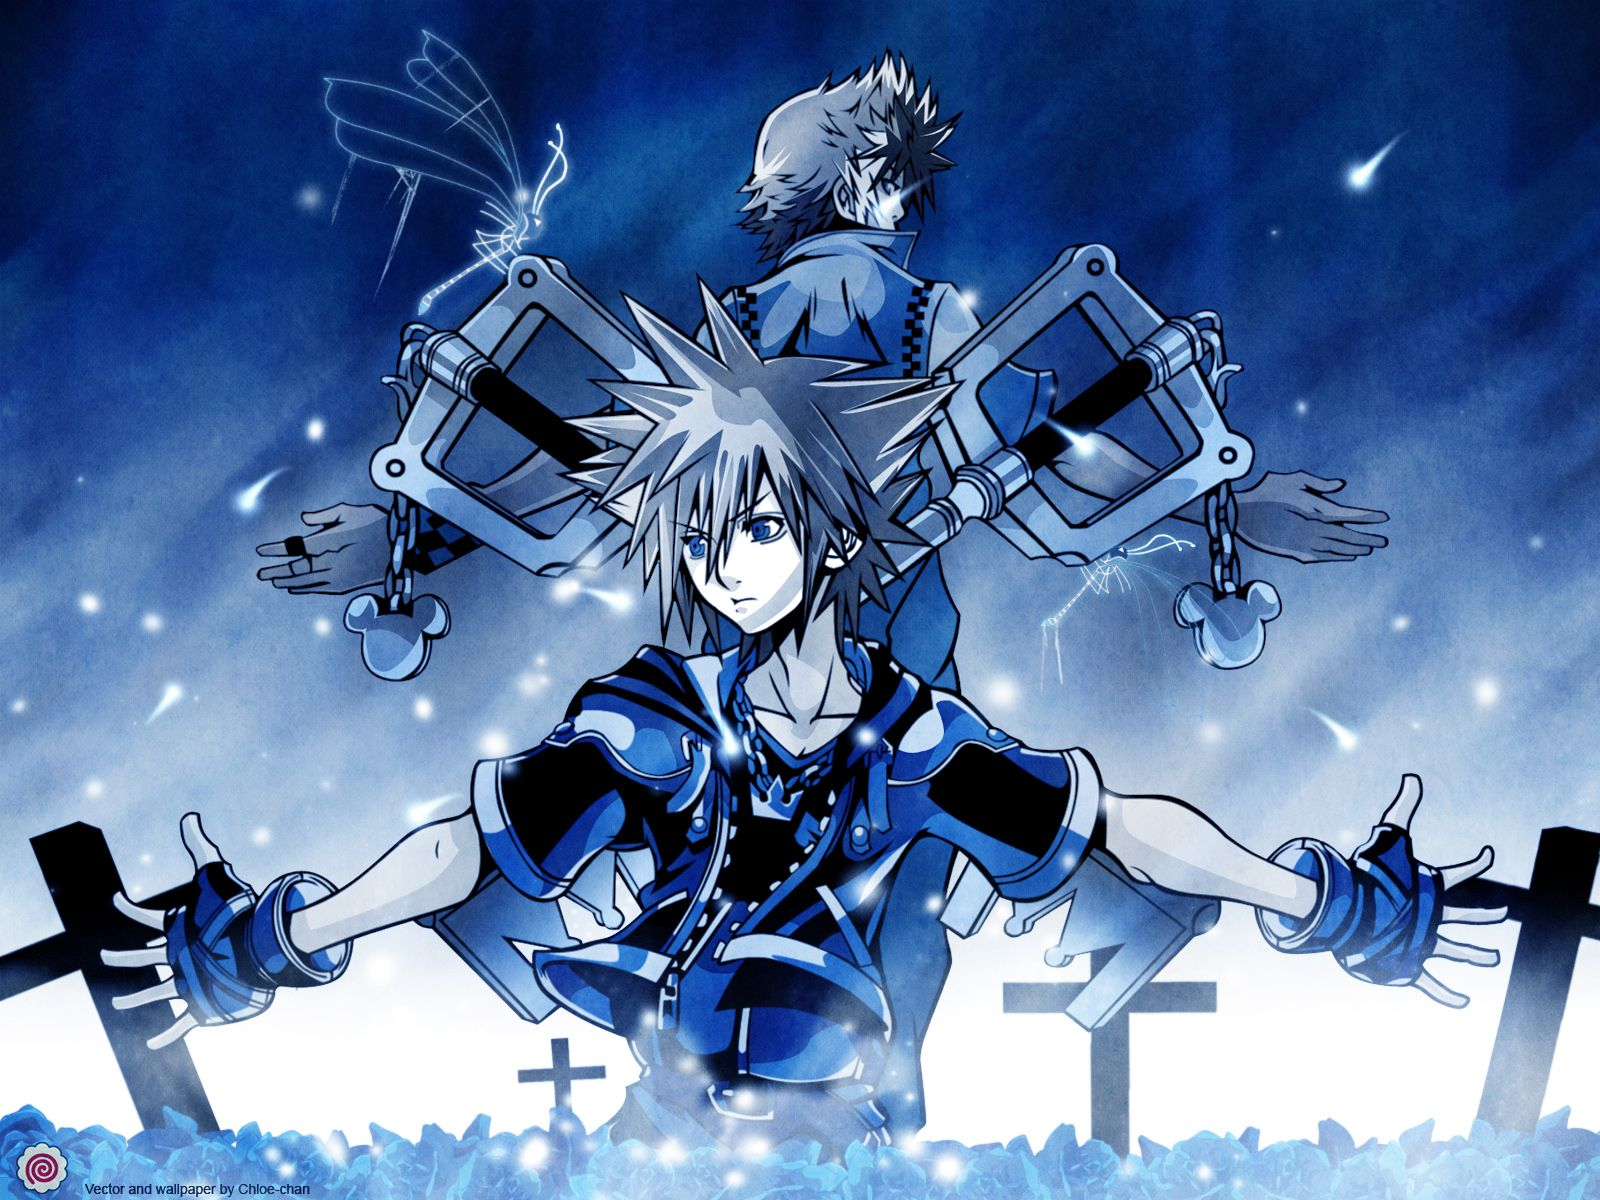 Roxas And Sora Imagenes Manga Videojuegos Fondo De Pantalla Kingdom Hearts